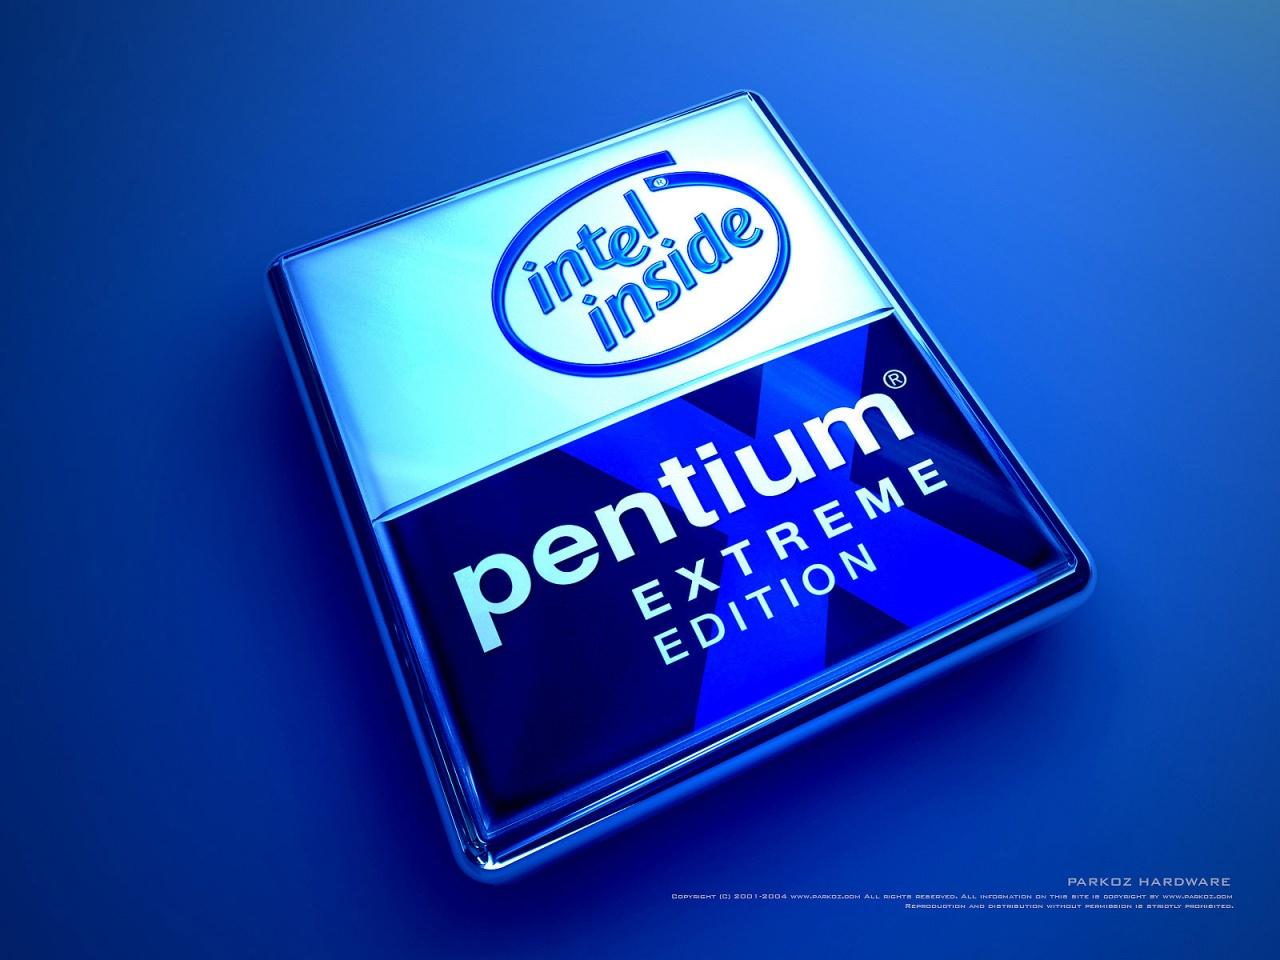 1280x960 Blue Pentium desktop PC and Mac wallpaper 1280x960